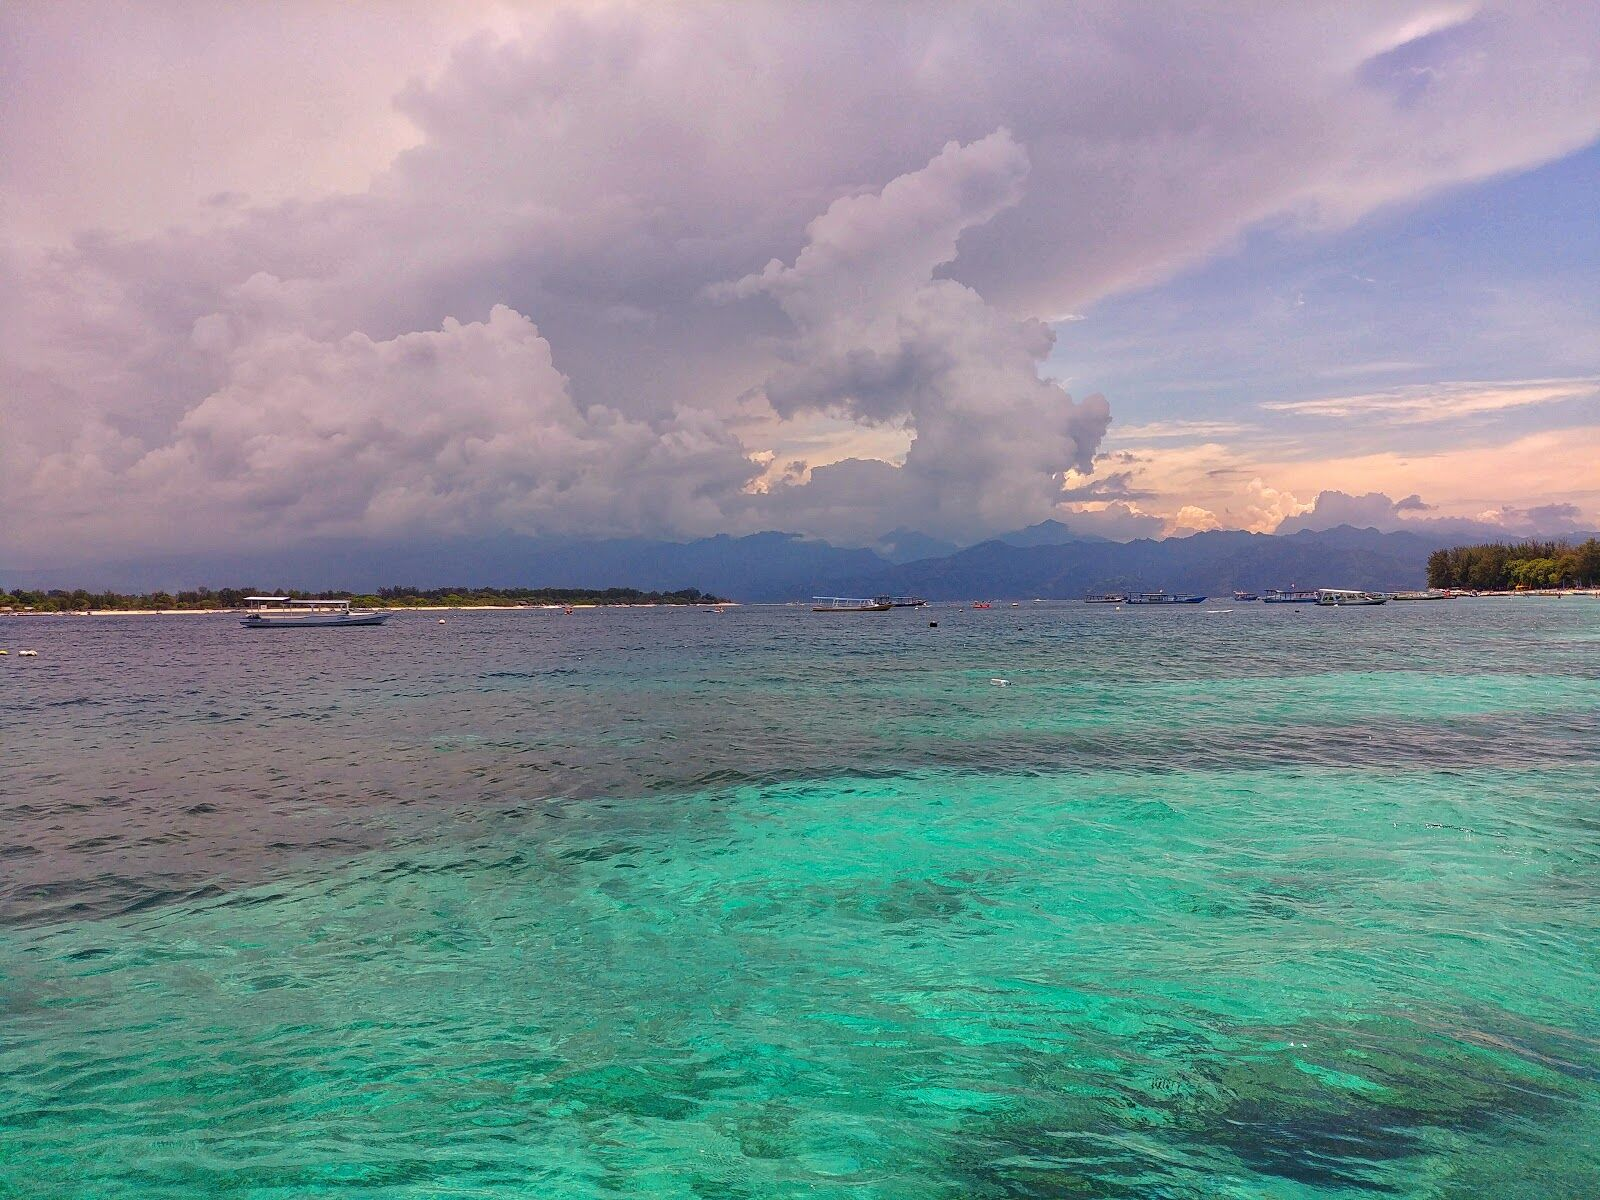 Острова Гили, Ломбок, Индонезия